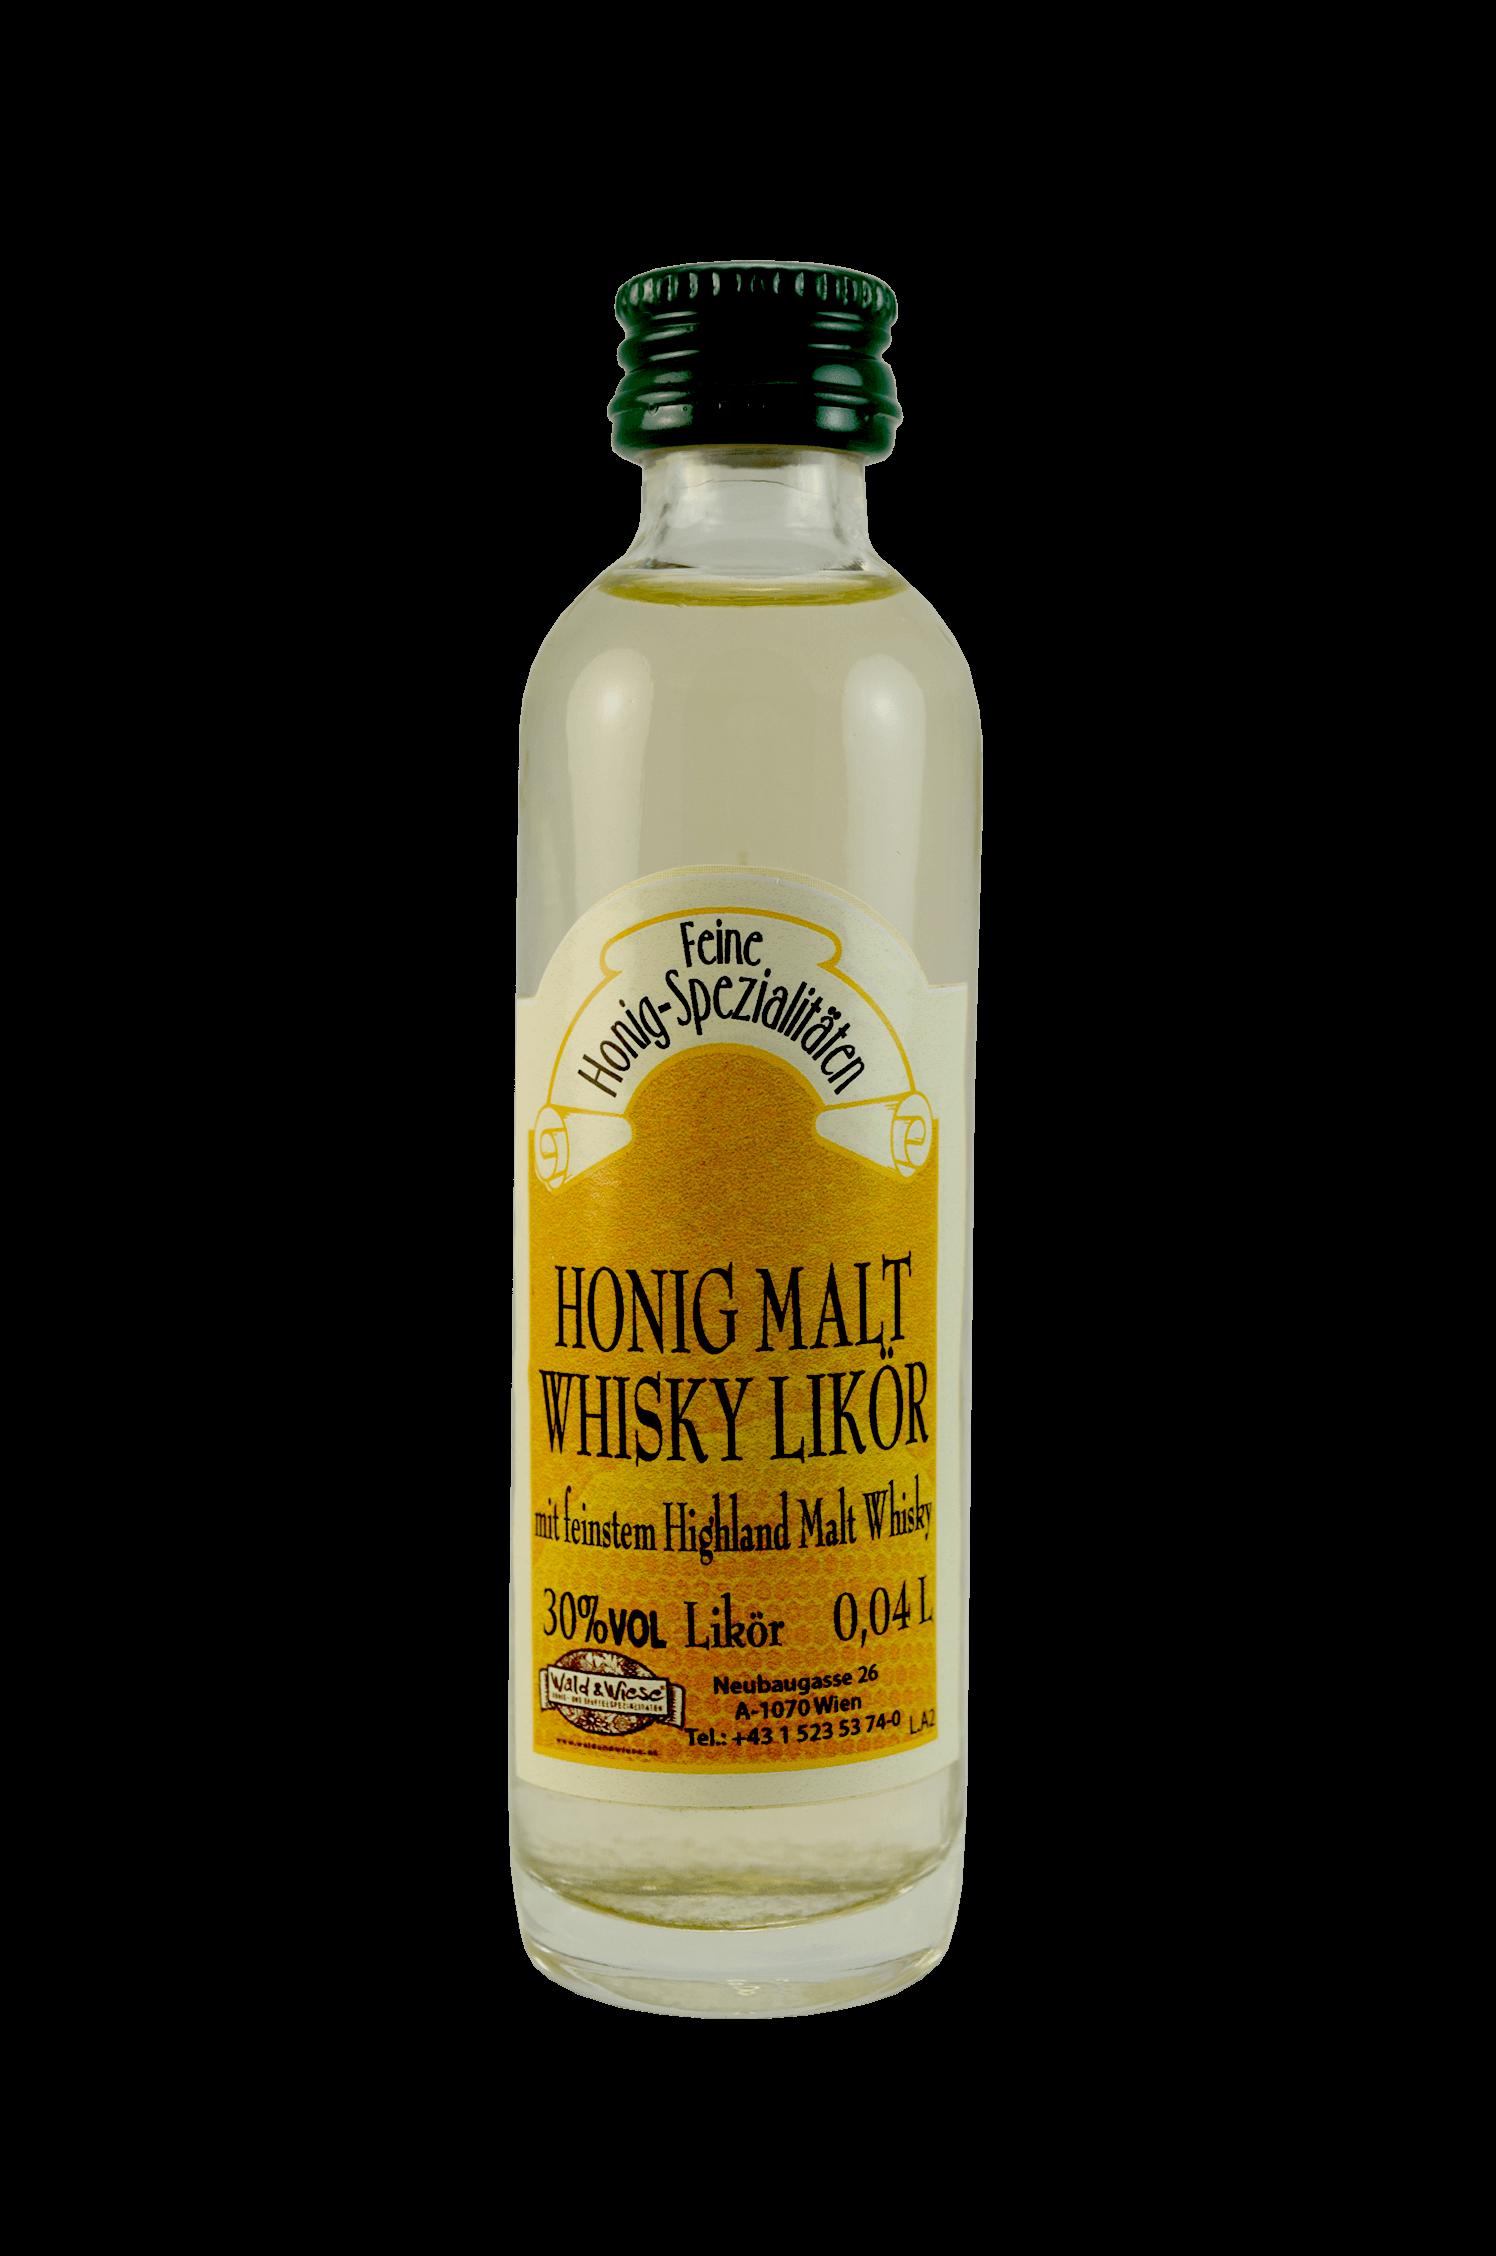 Hinig Malt Whisky Likör